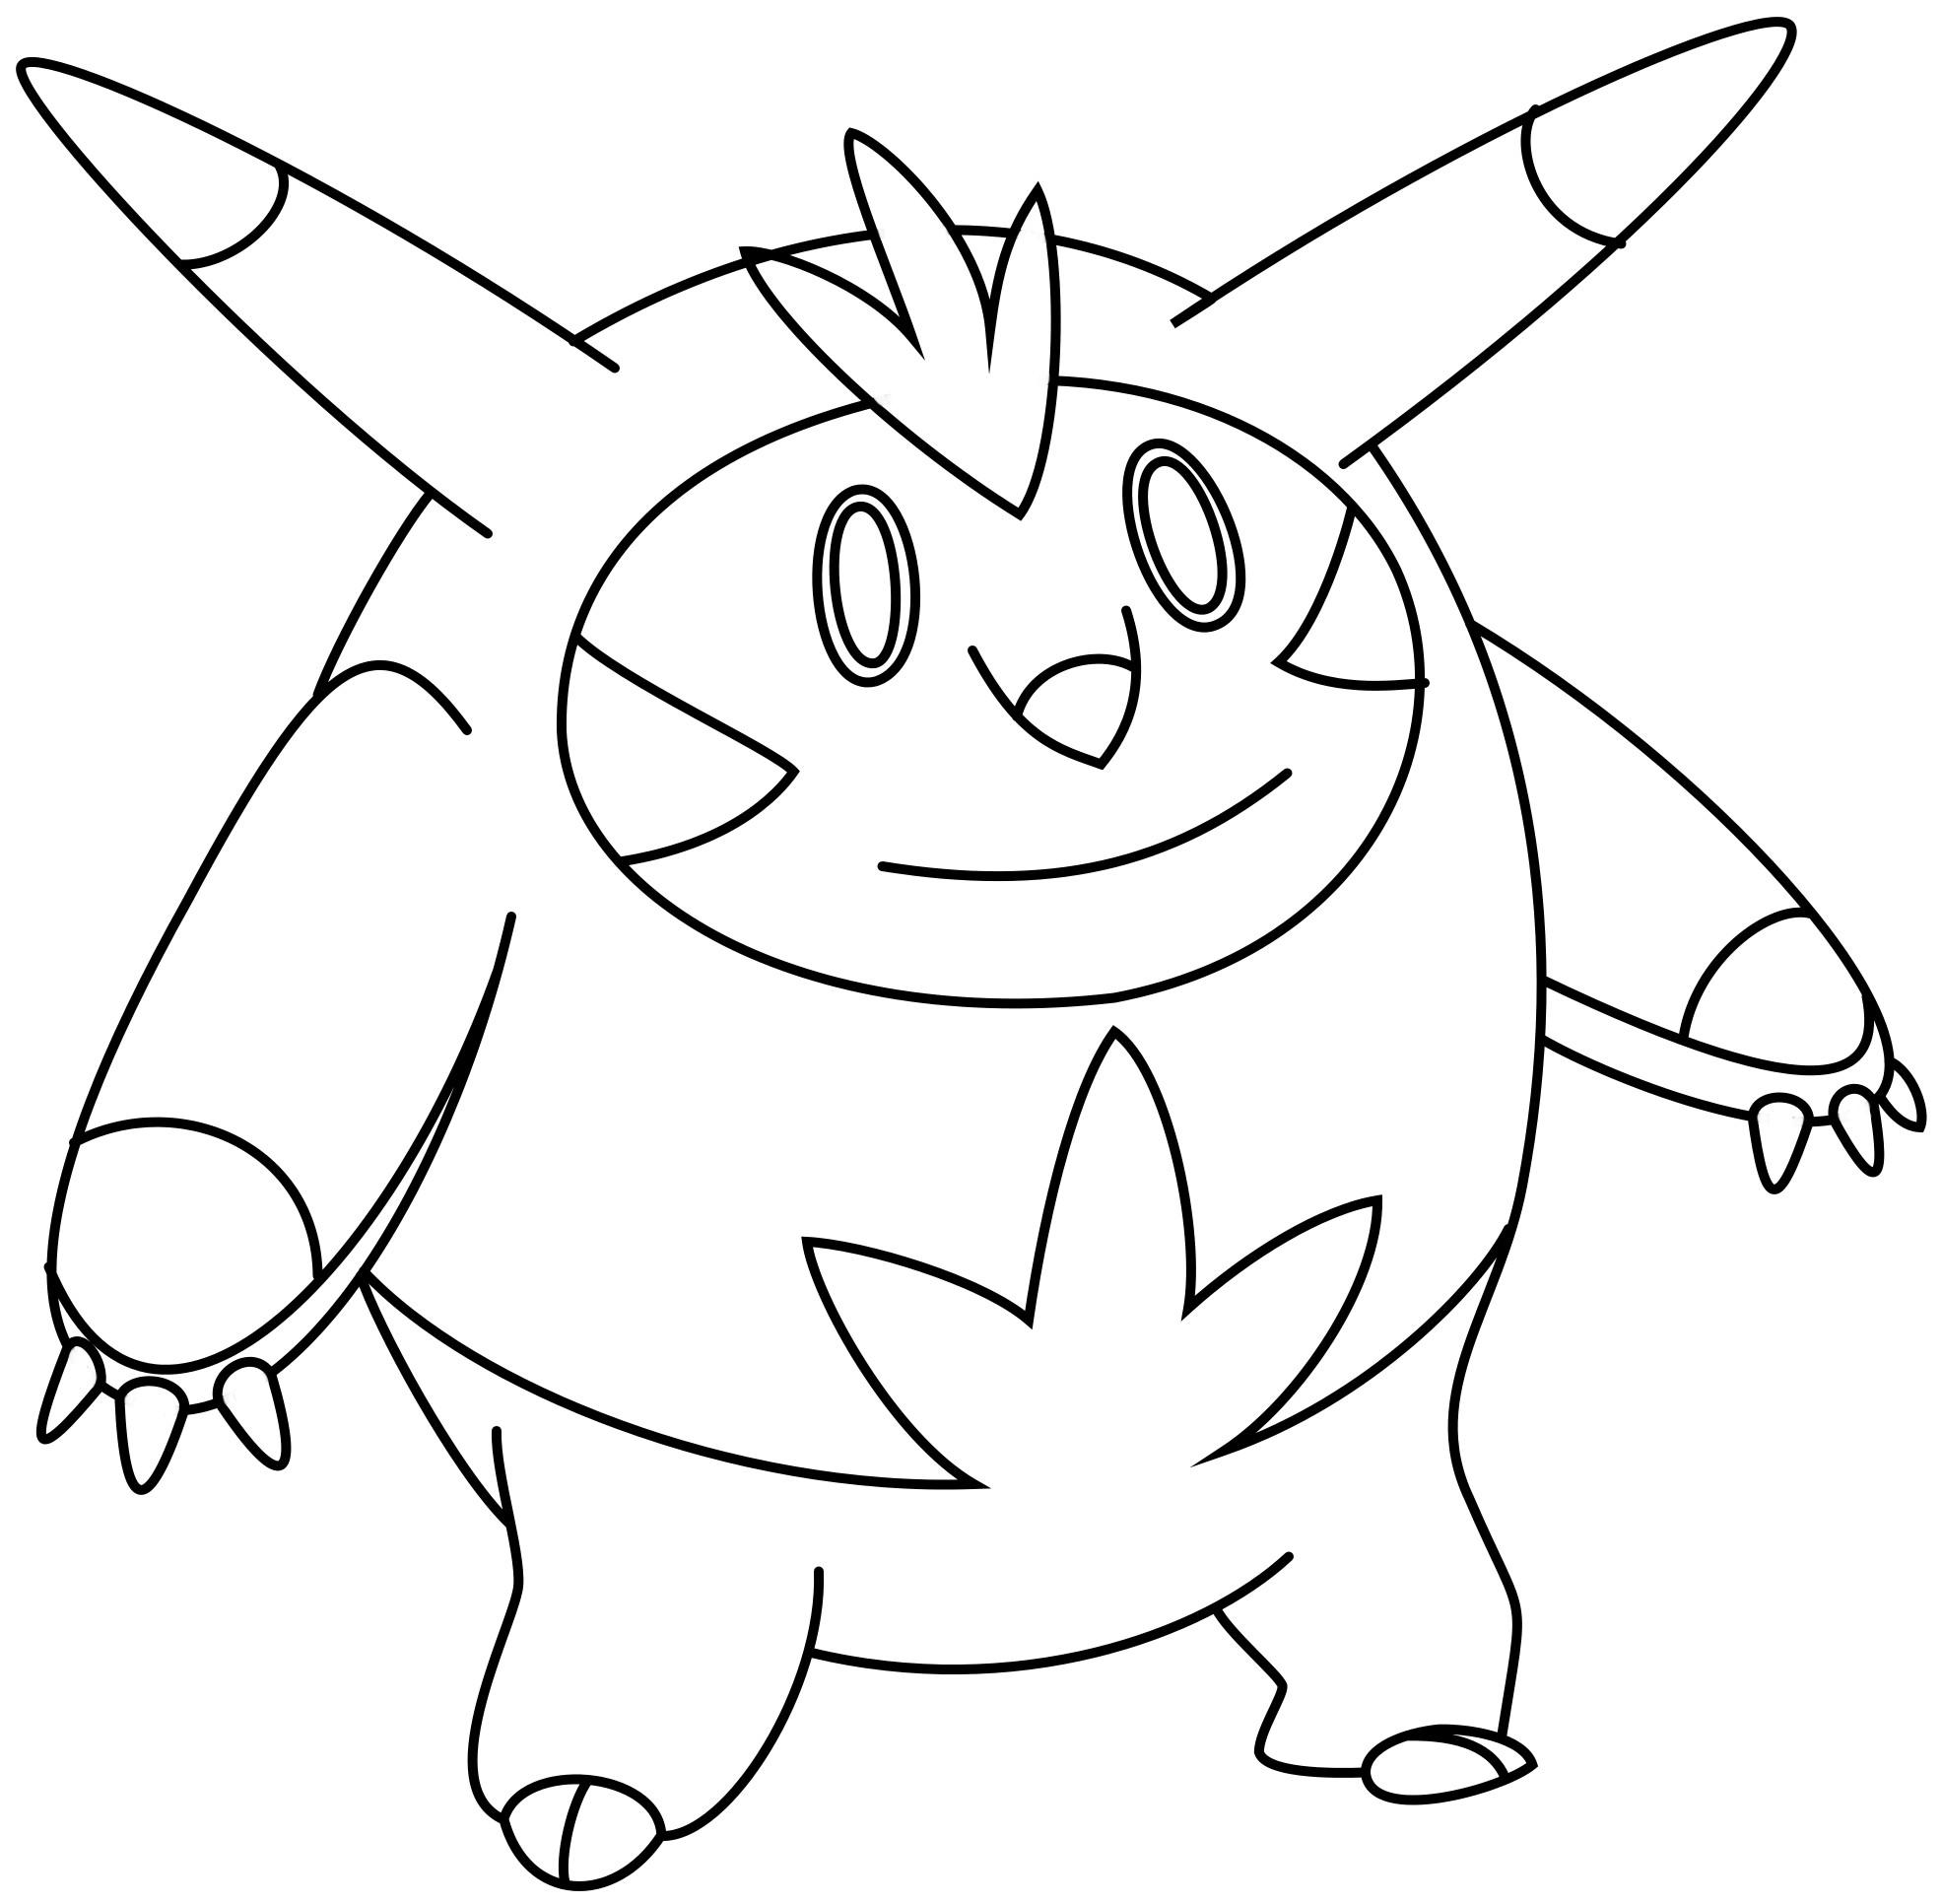 Ausmalbilder Pokemon 14 Ausmalbilder Pokemon Mewtu Ausmalbilder